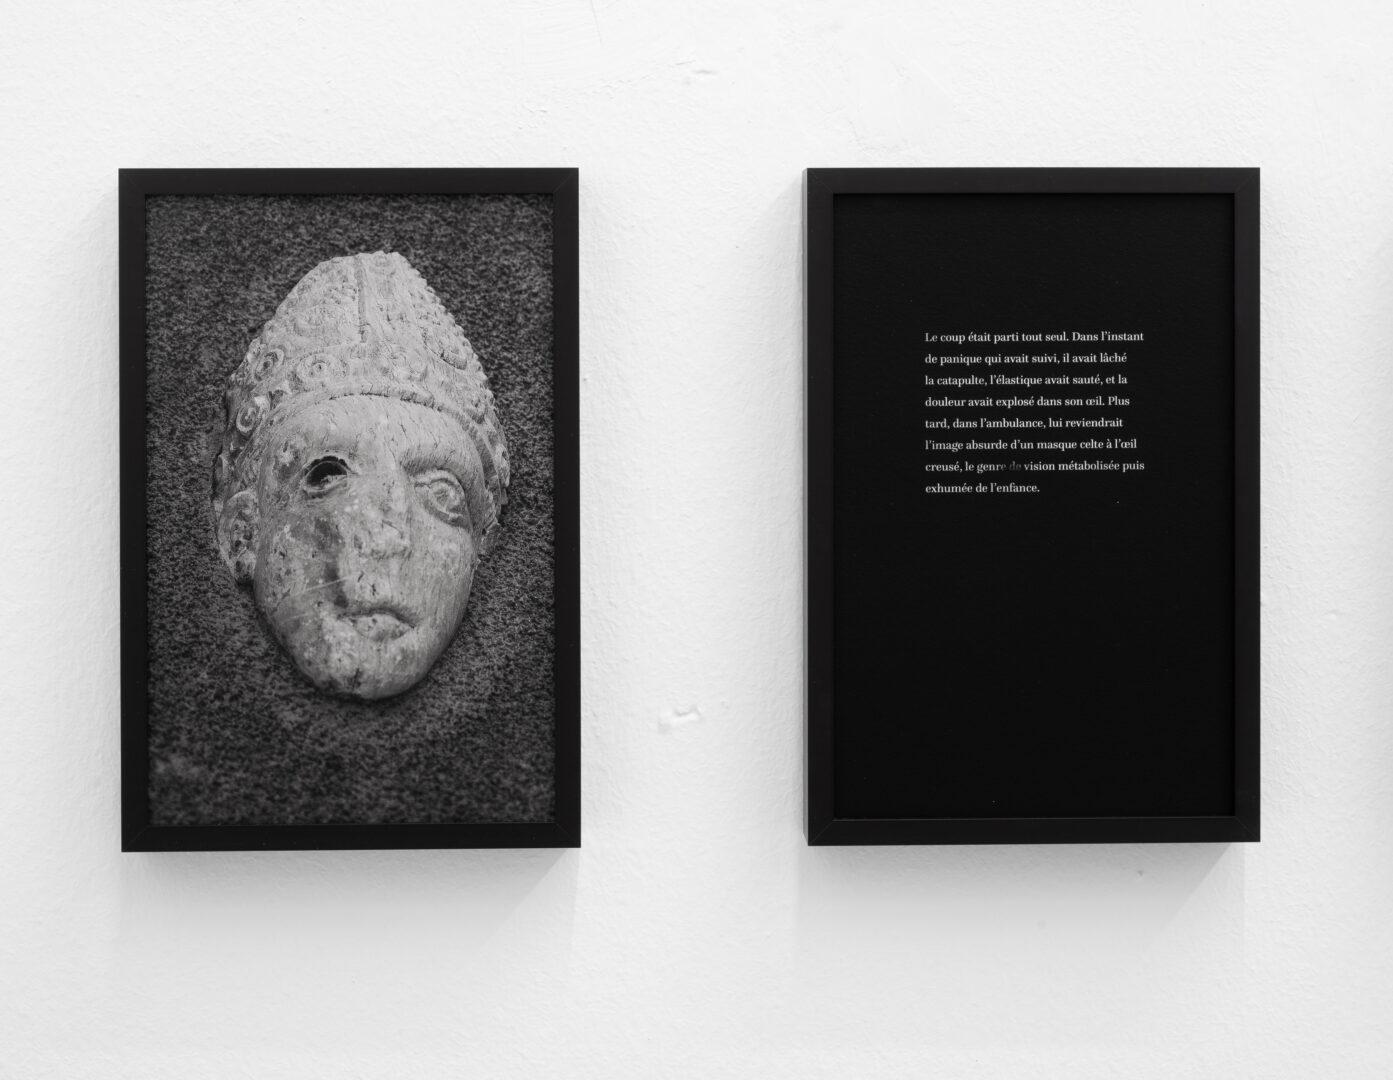 Exhibition View Rinny Gremaud and Mathieu Bernard Soloshow «Splendide; view on Loeil, 2019» at Galerie Heinzer Reszler, Lausanne, 2019 / Photo: Julien Gremaud / Courtesy: the artist and Heinzer Reszler